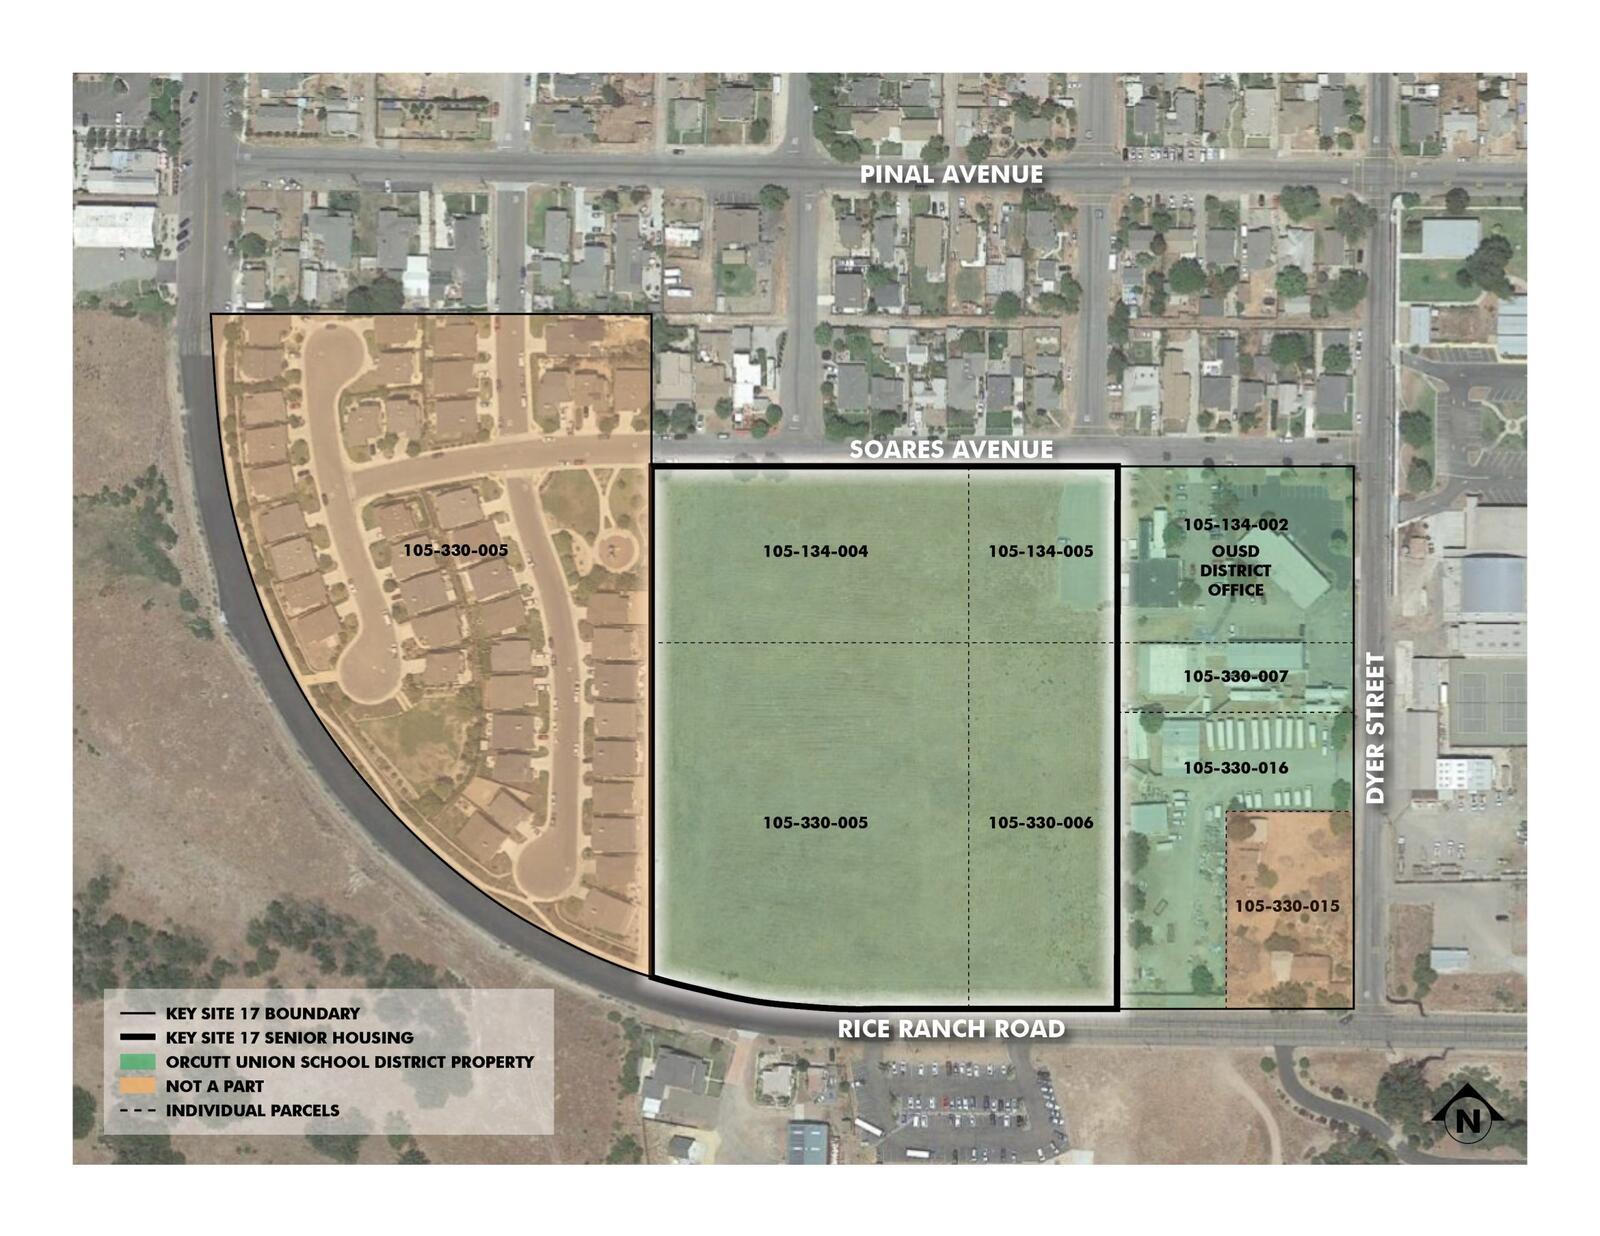 Key Site 17 Senior Housing Parcel Map